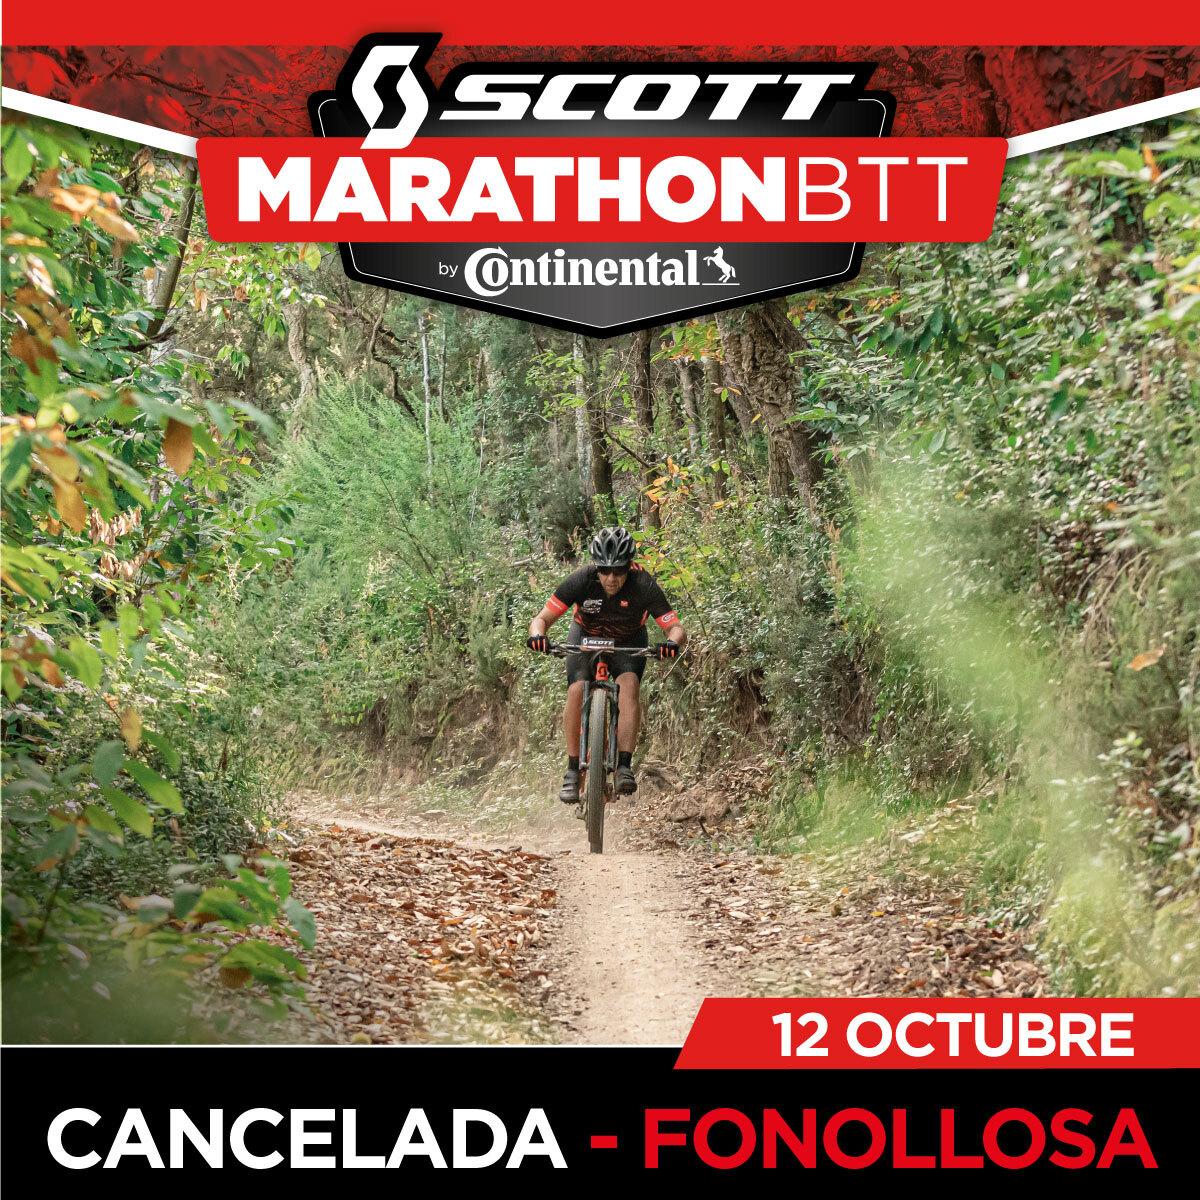 LA SCOTT MARATHON BTT BY CONTINENTAL DE FONOLLOSA SE CANCELA